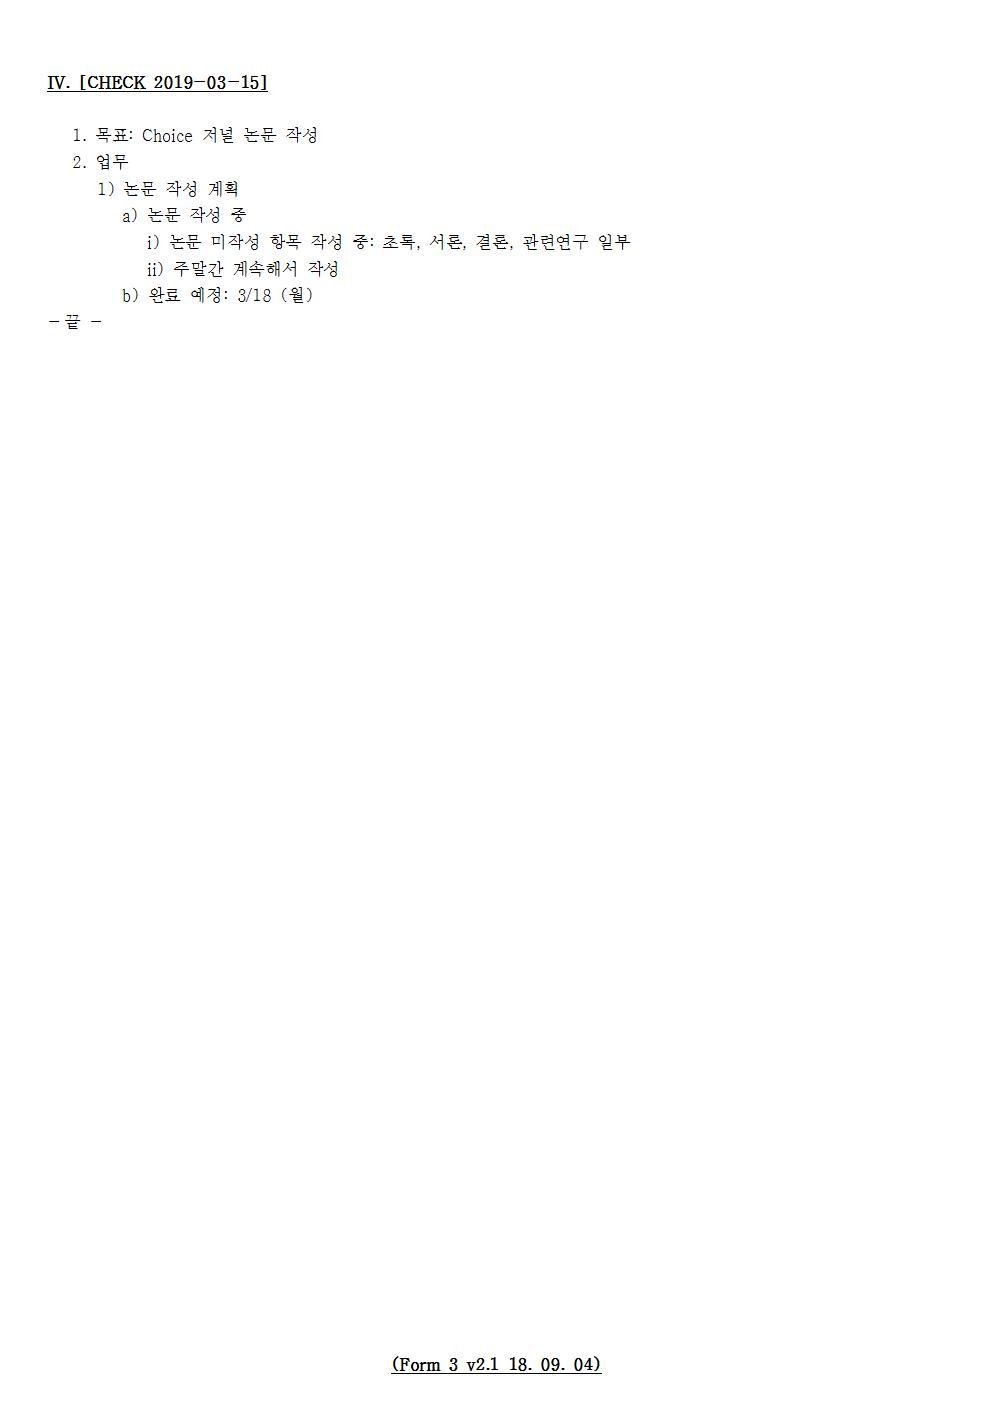 D-[19-011-PP-03]-[Choice Journal]-[2019-03-15][YB]002.jpg